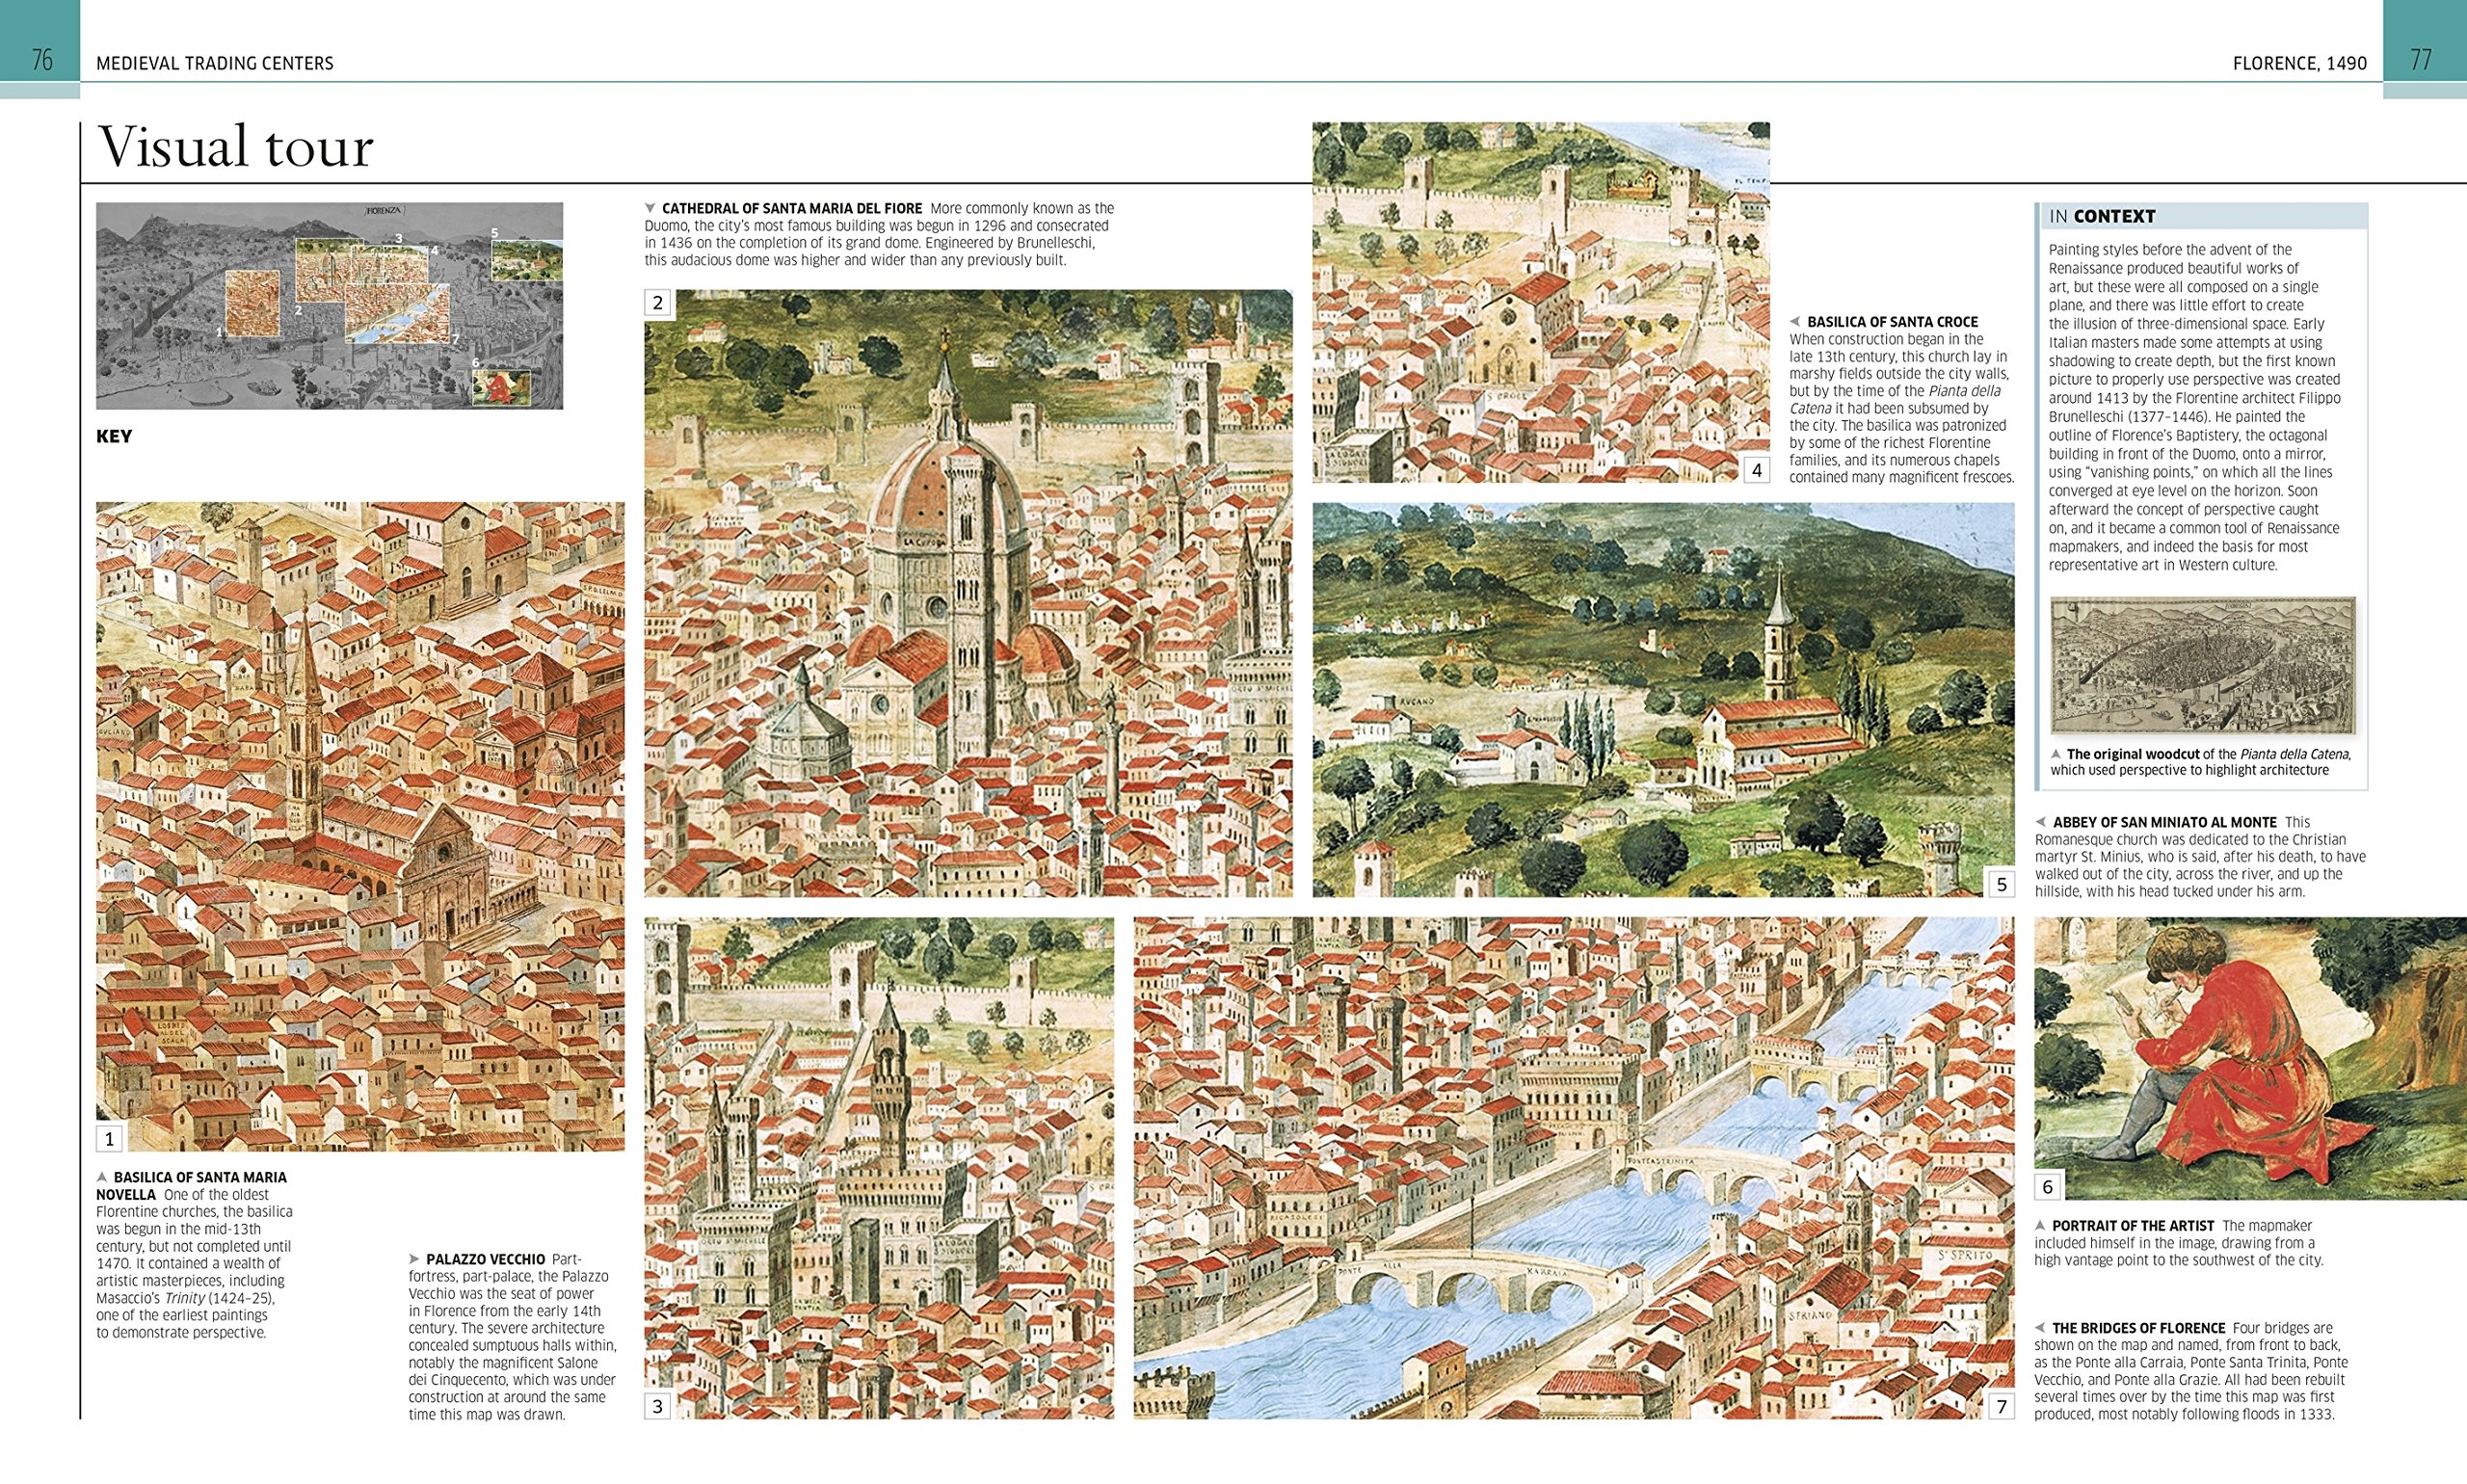 Amazon Smithsonian Great City Maps 9781465453587 DK Books